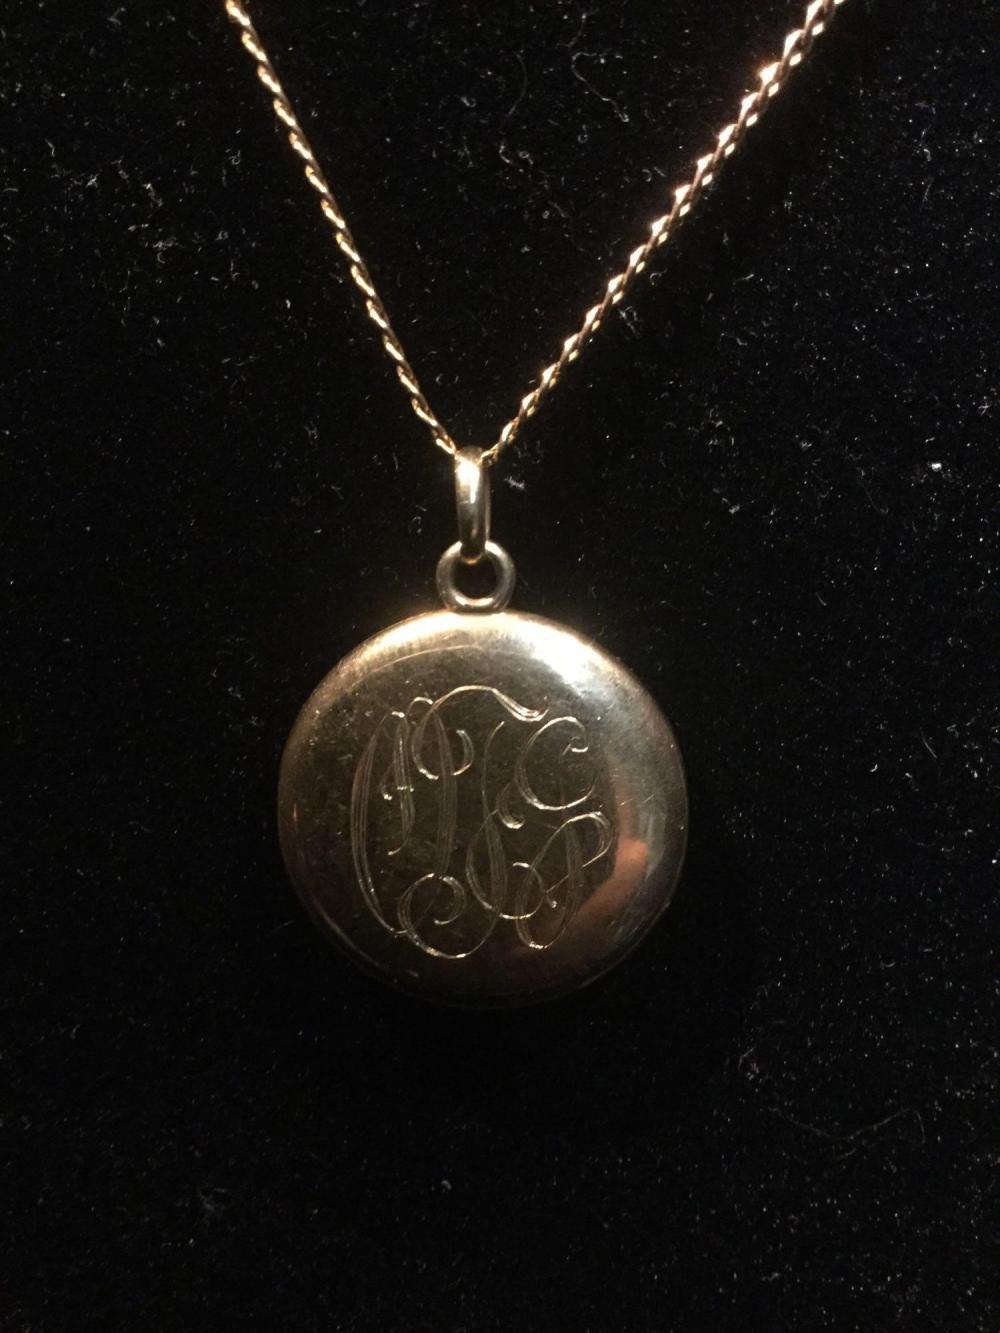 Lot 173: Vintage 14k gold monogrammed locket feat. a purple topaz stone set in back - 5 grams total